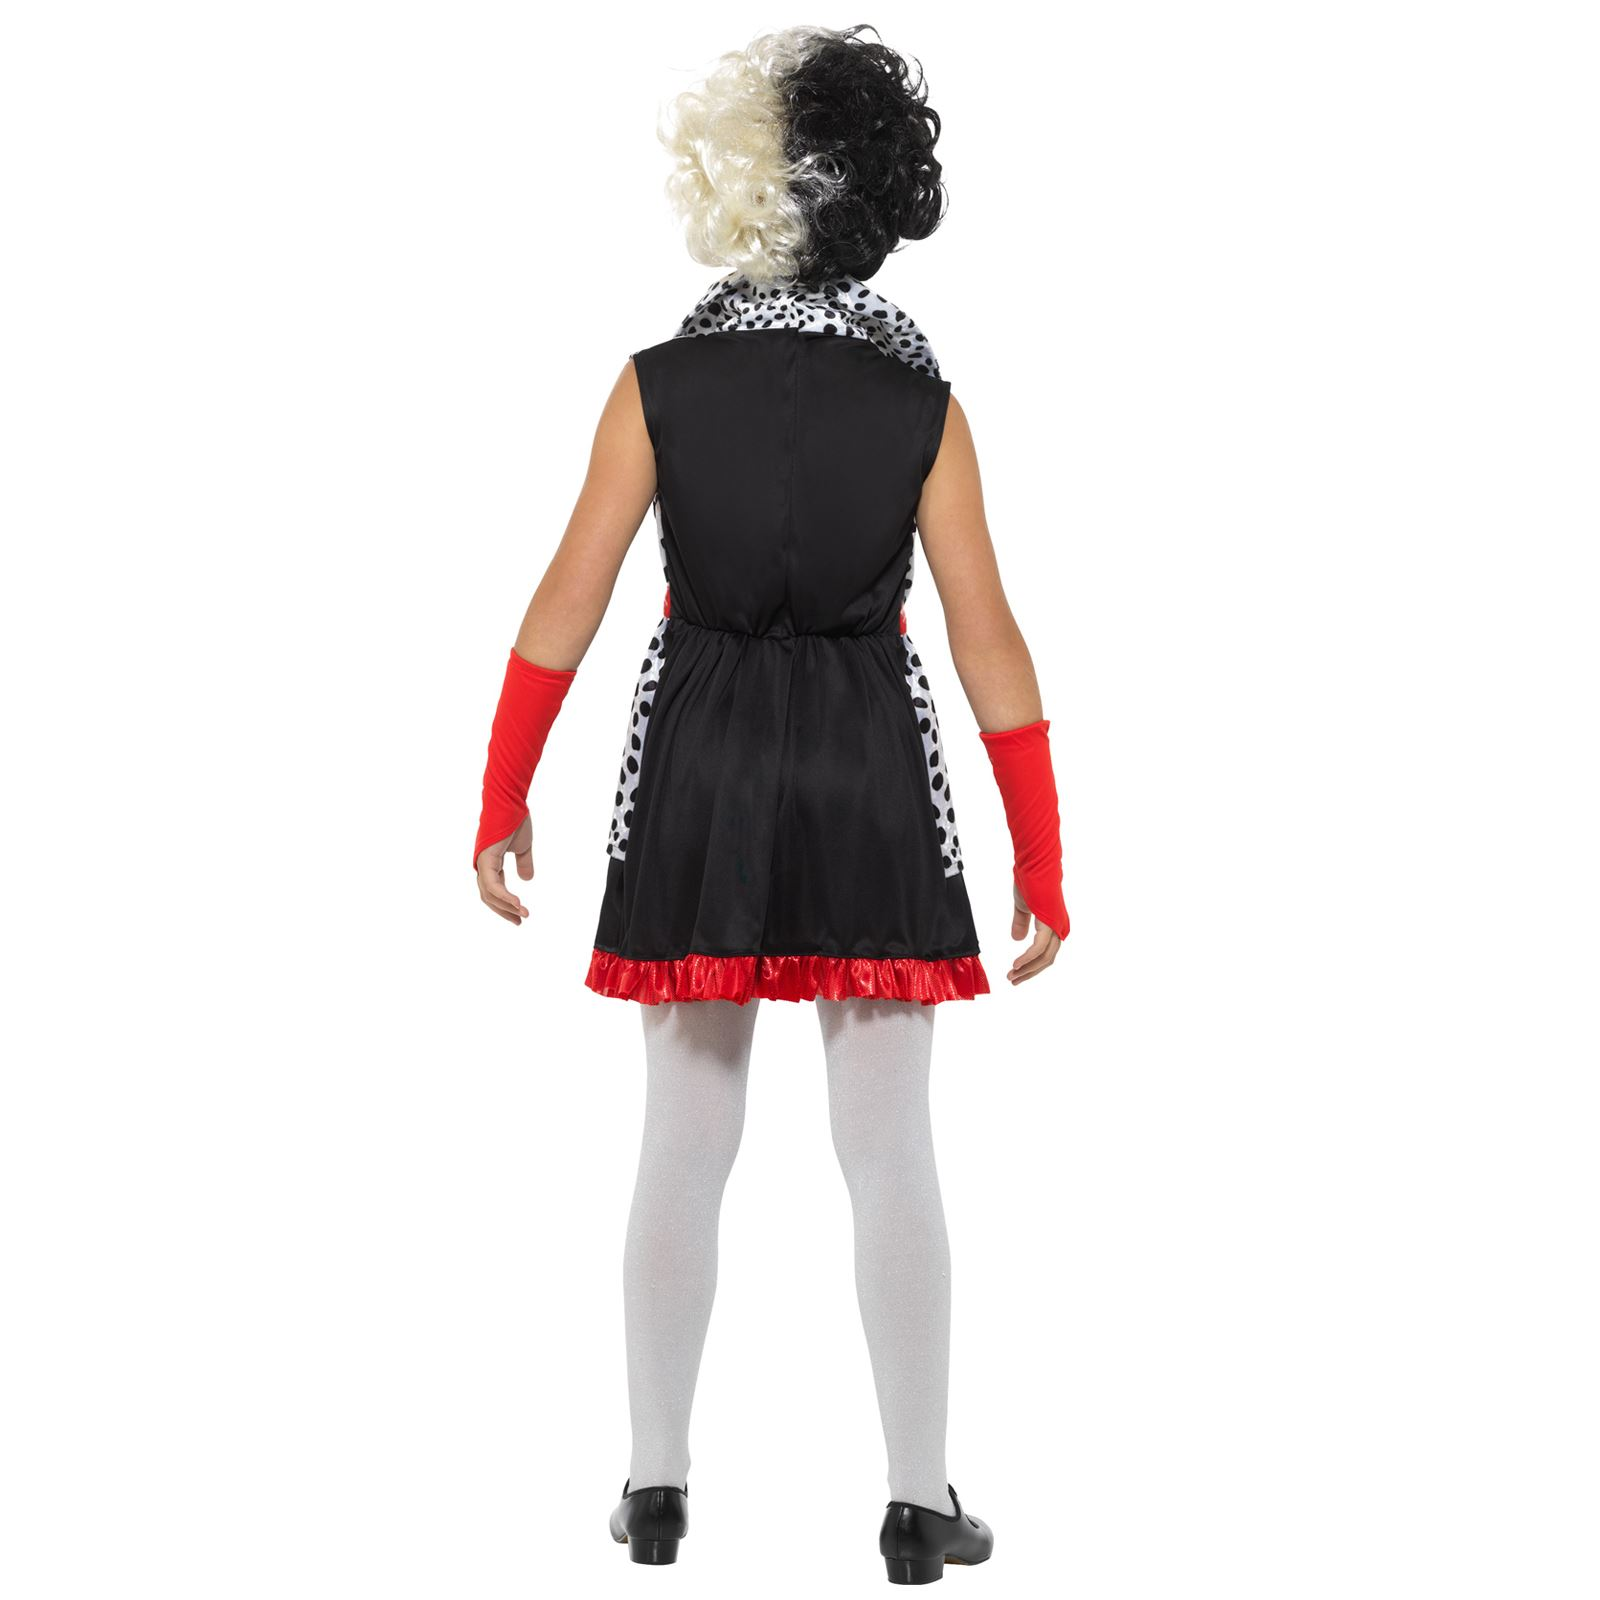 Le Ragazze Roald Dahl Sophie da BFG Costume Libro Day Outfit Da Smiffys